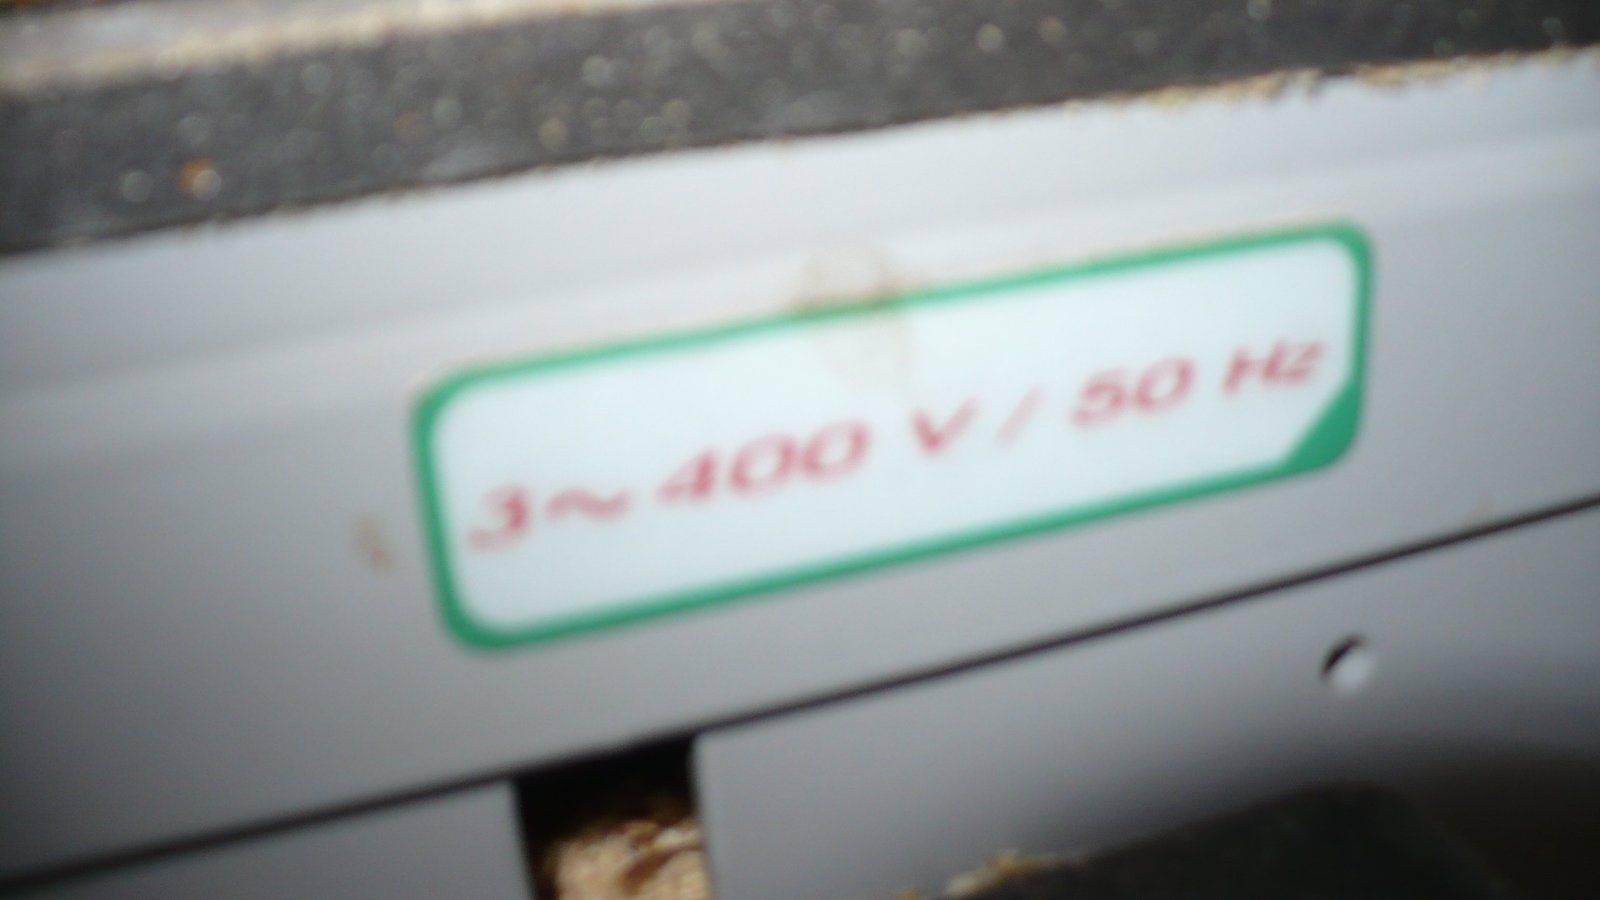 P1020526.JPG